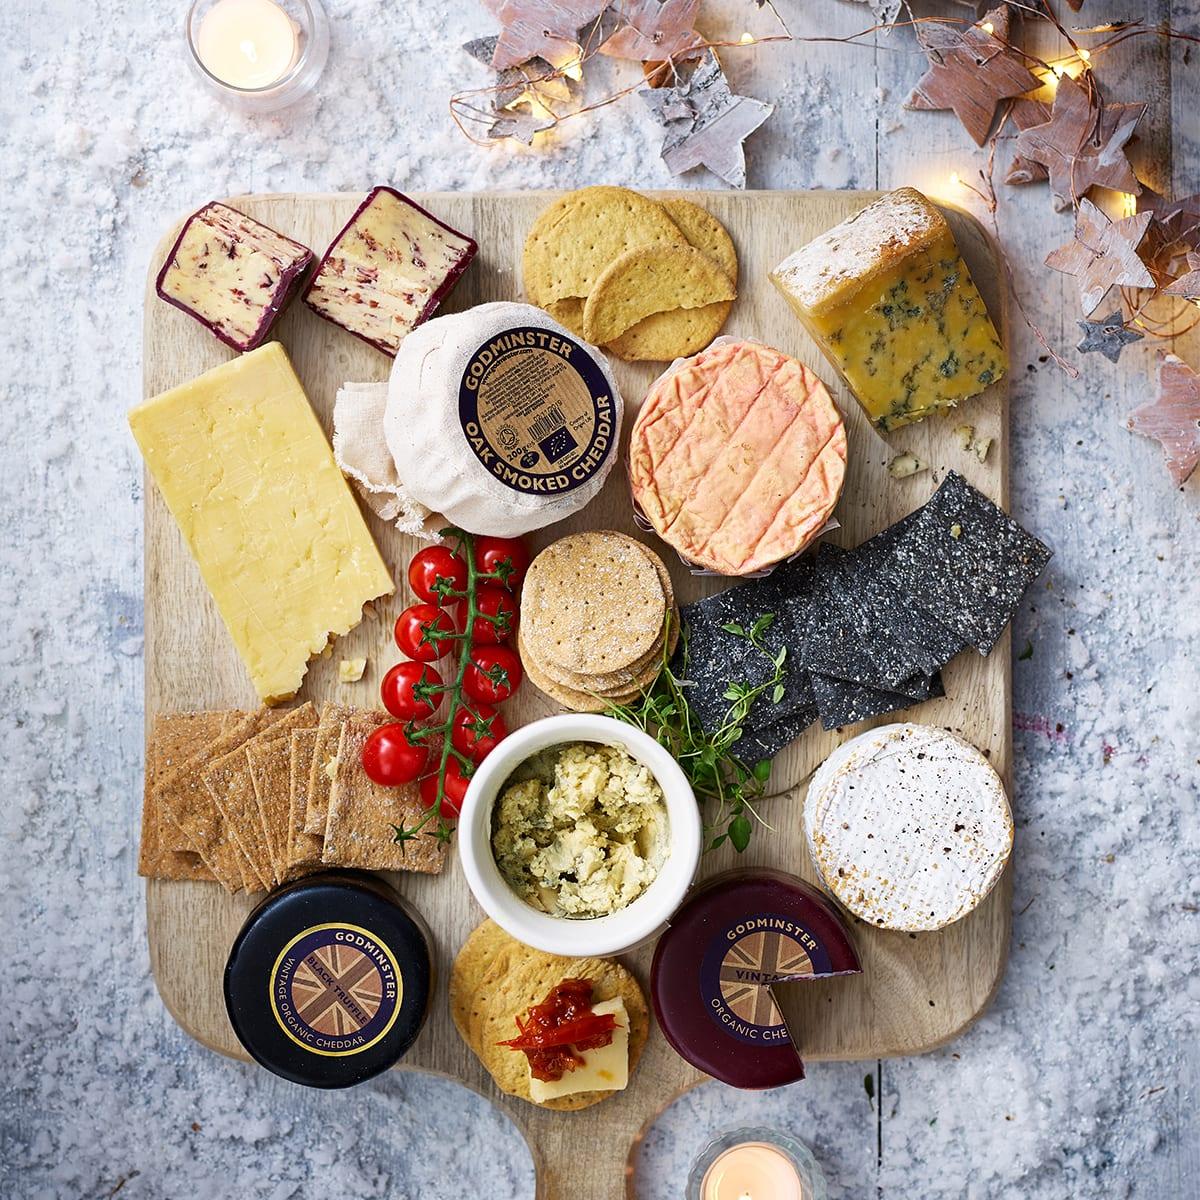 Ford Farm Wensleydale & Cranberry Round Cheese, 200g